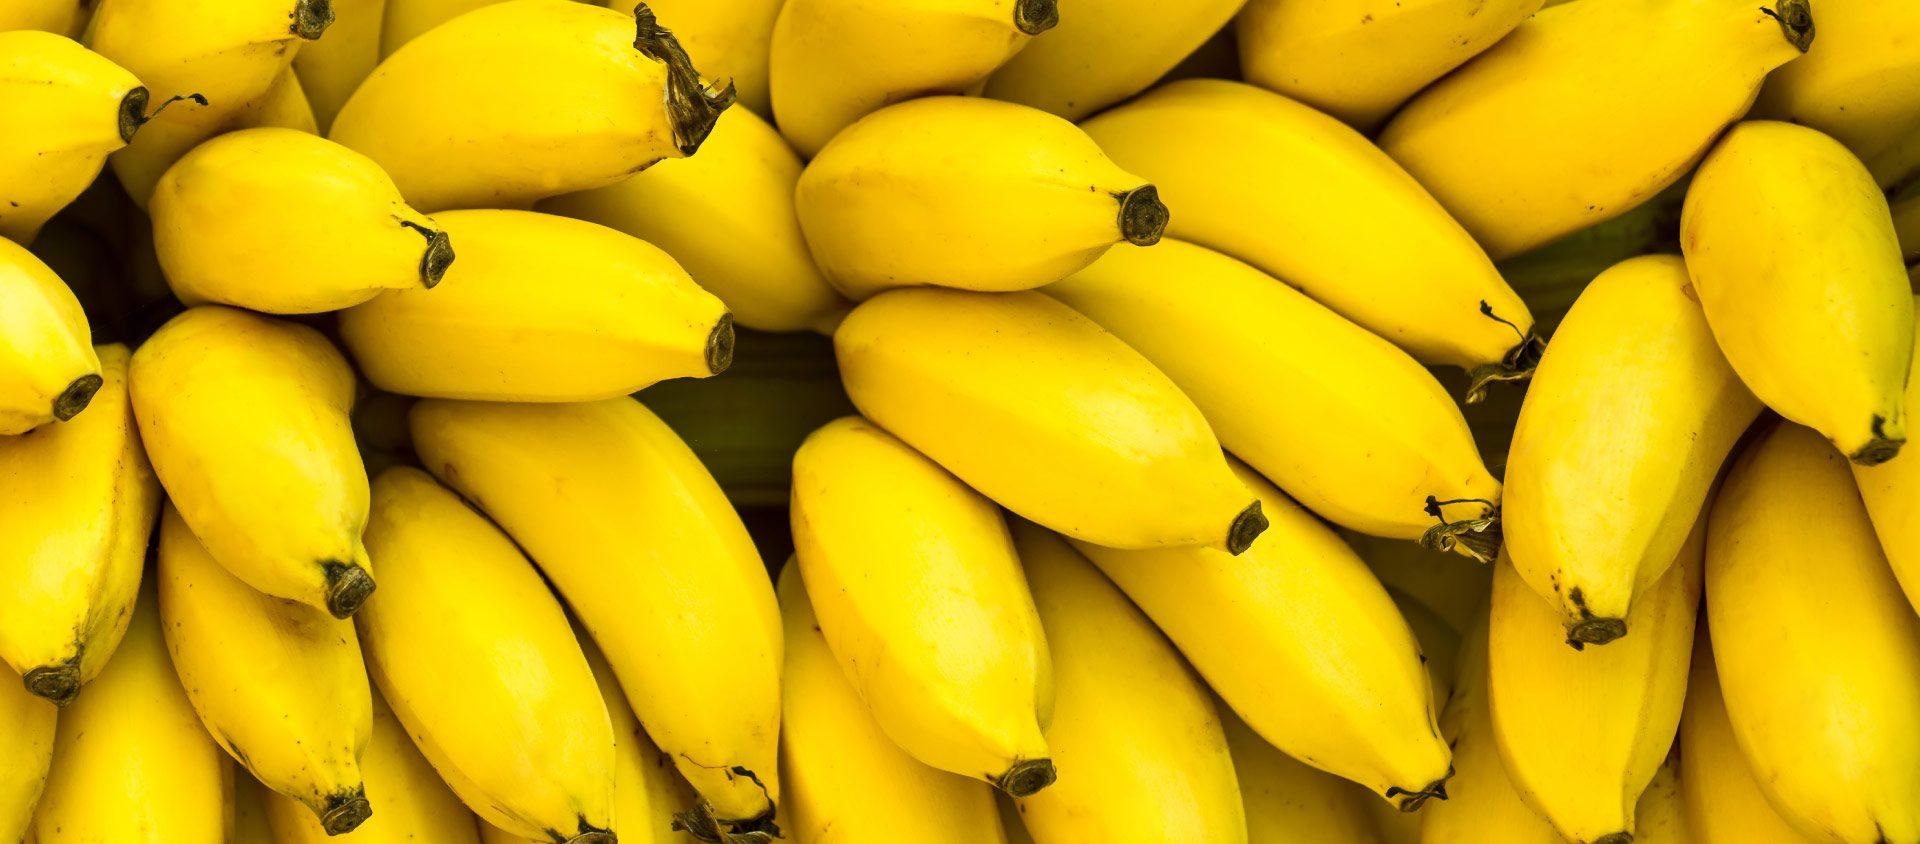 Da flor ao fruto: saiba aproveitar todos os benefícios da banana